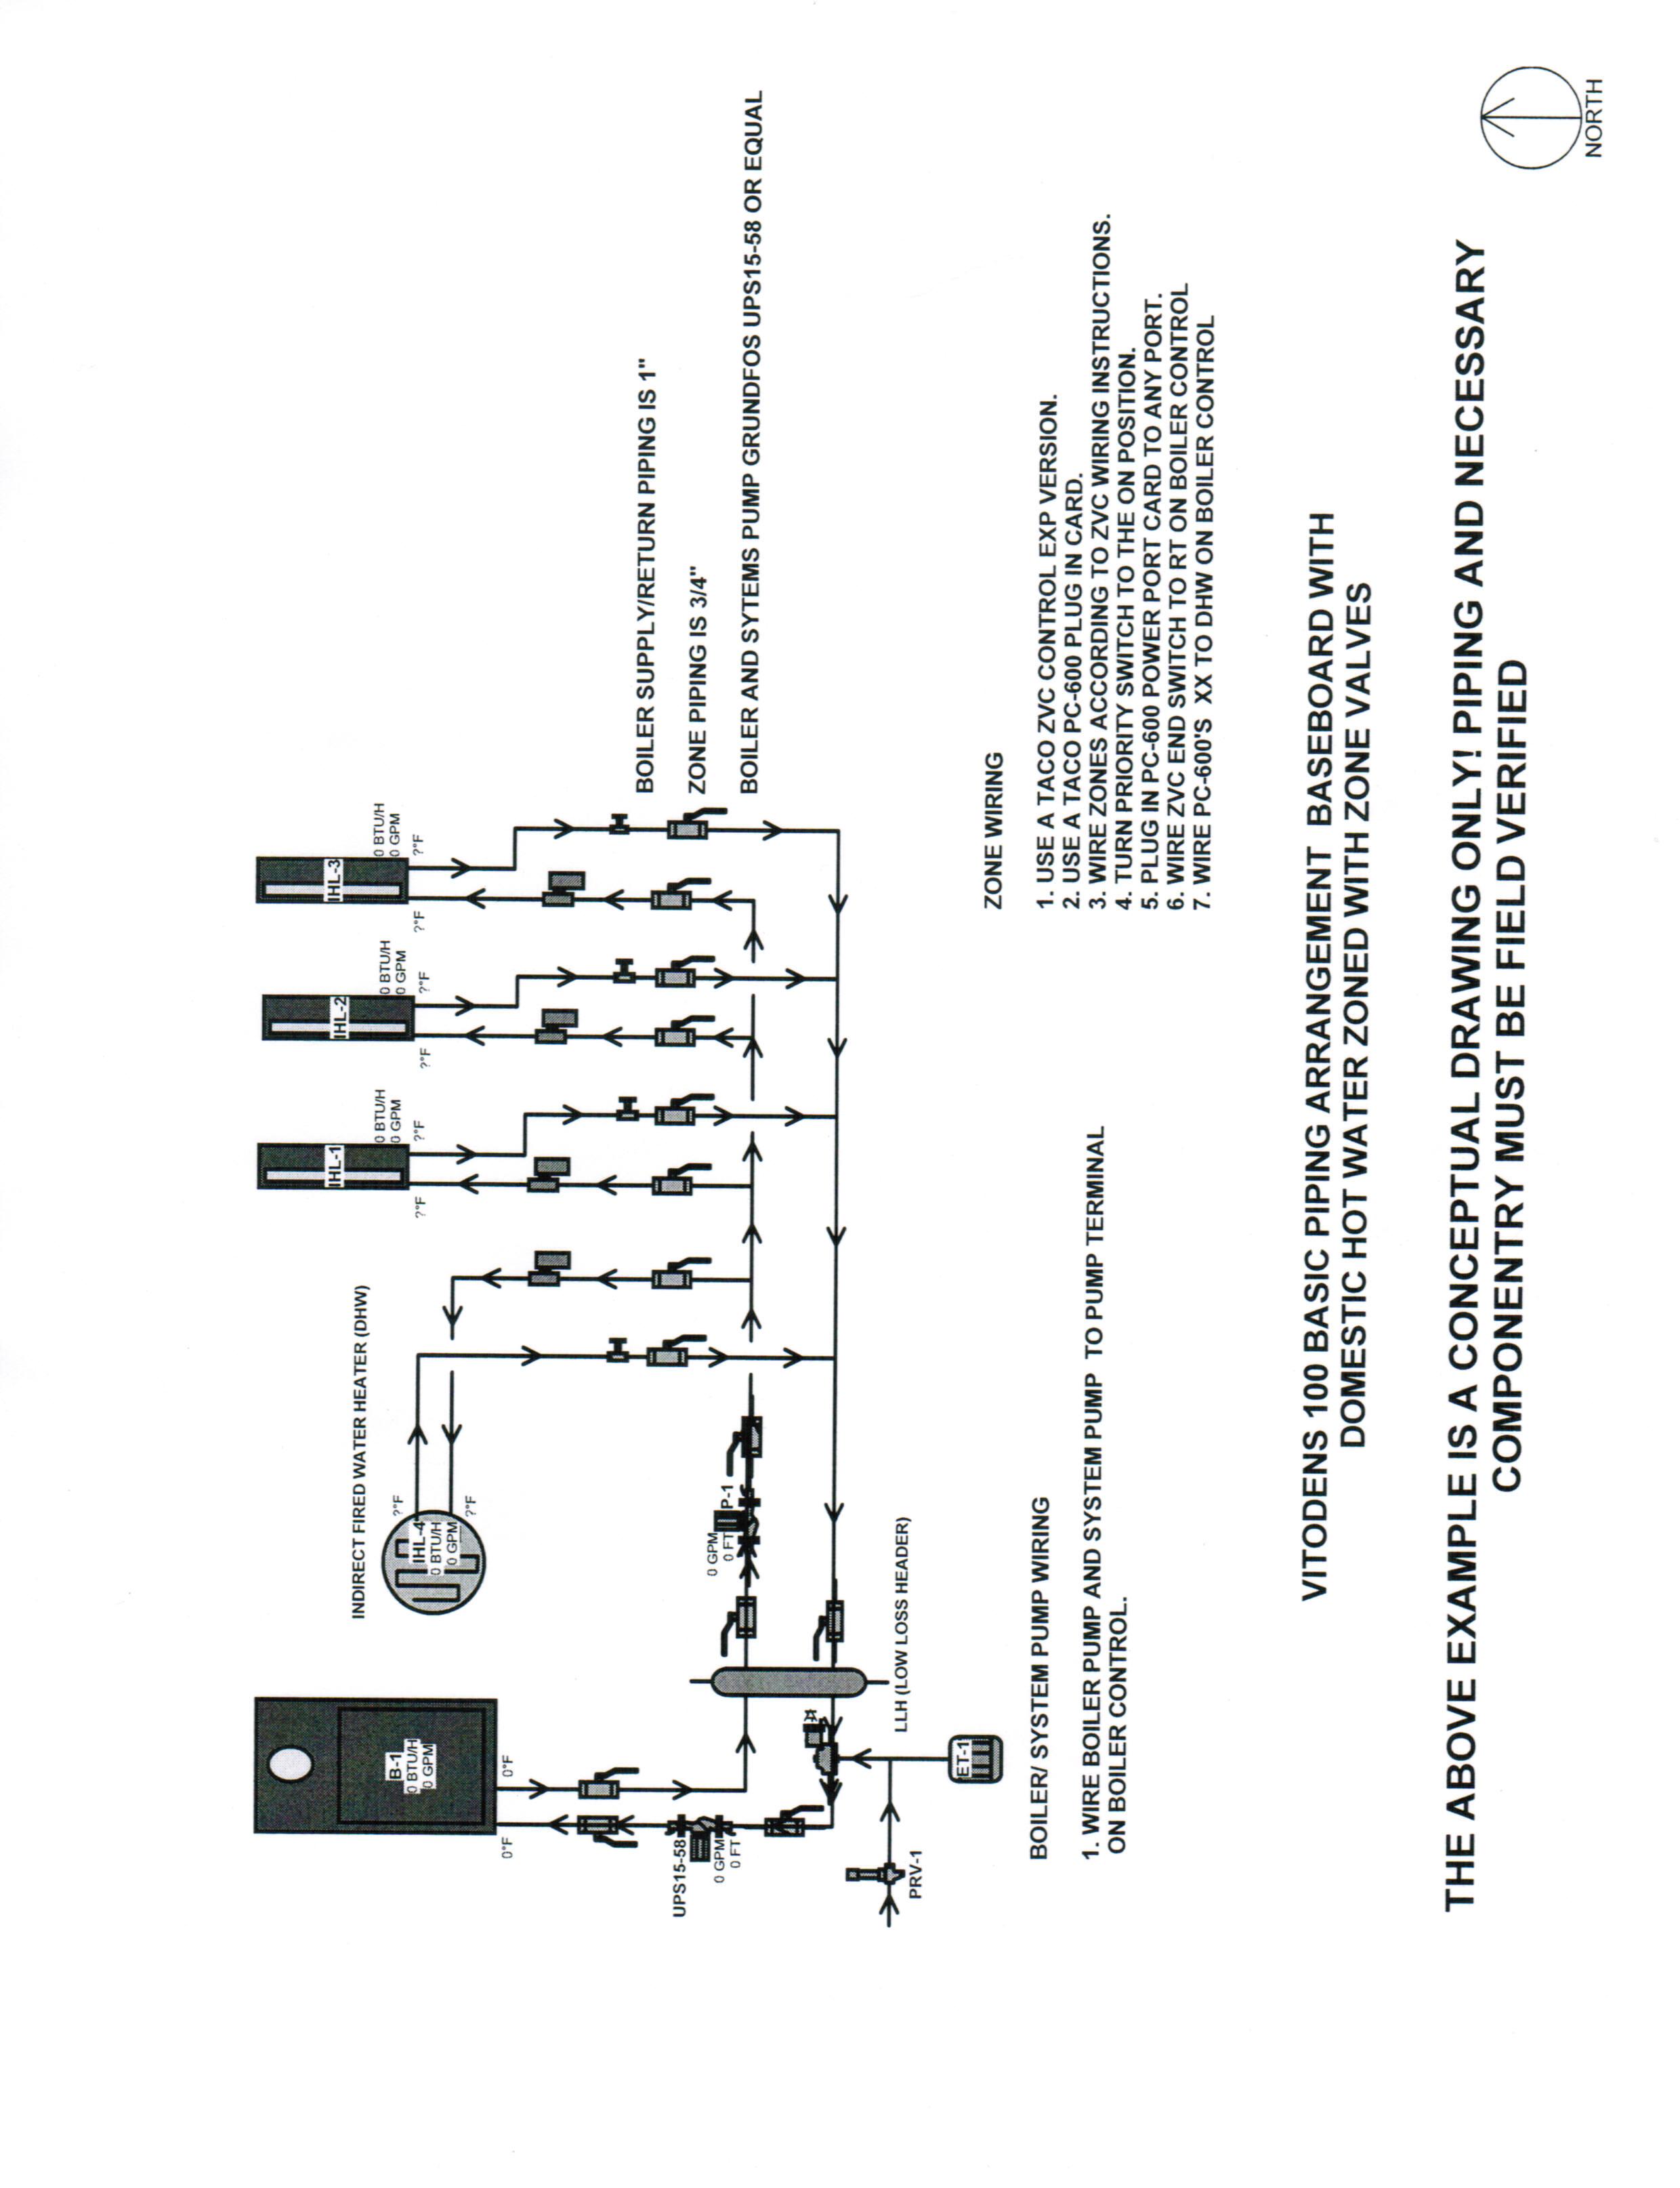 1990 Yamaha Xt 600 Wiring Diagram